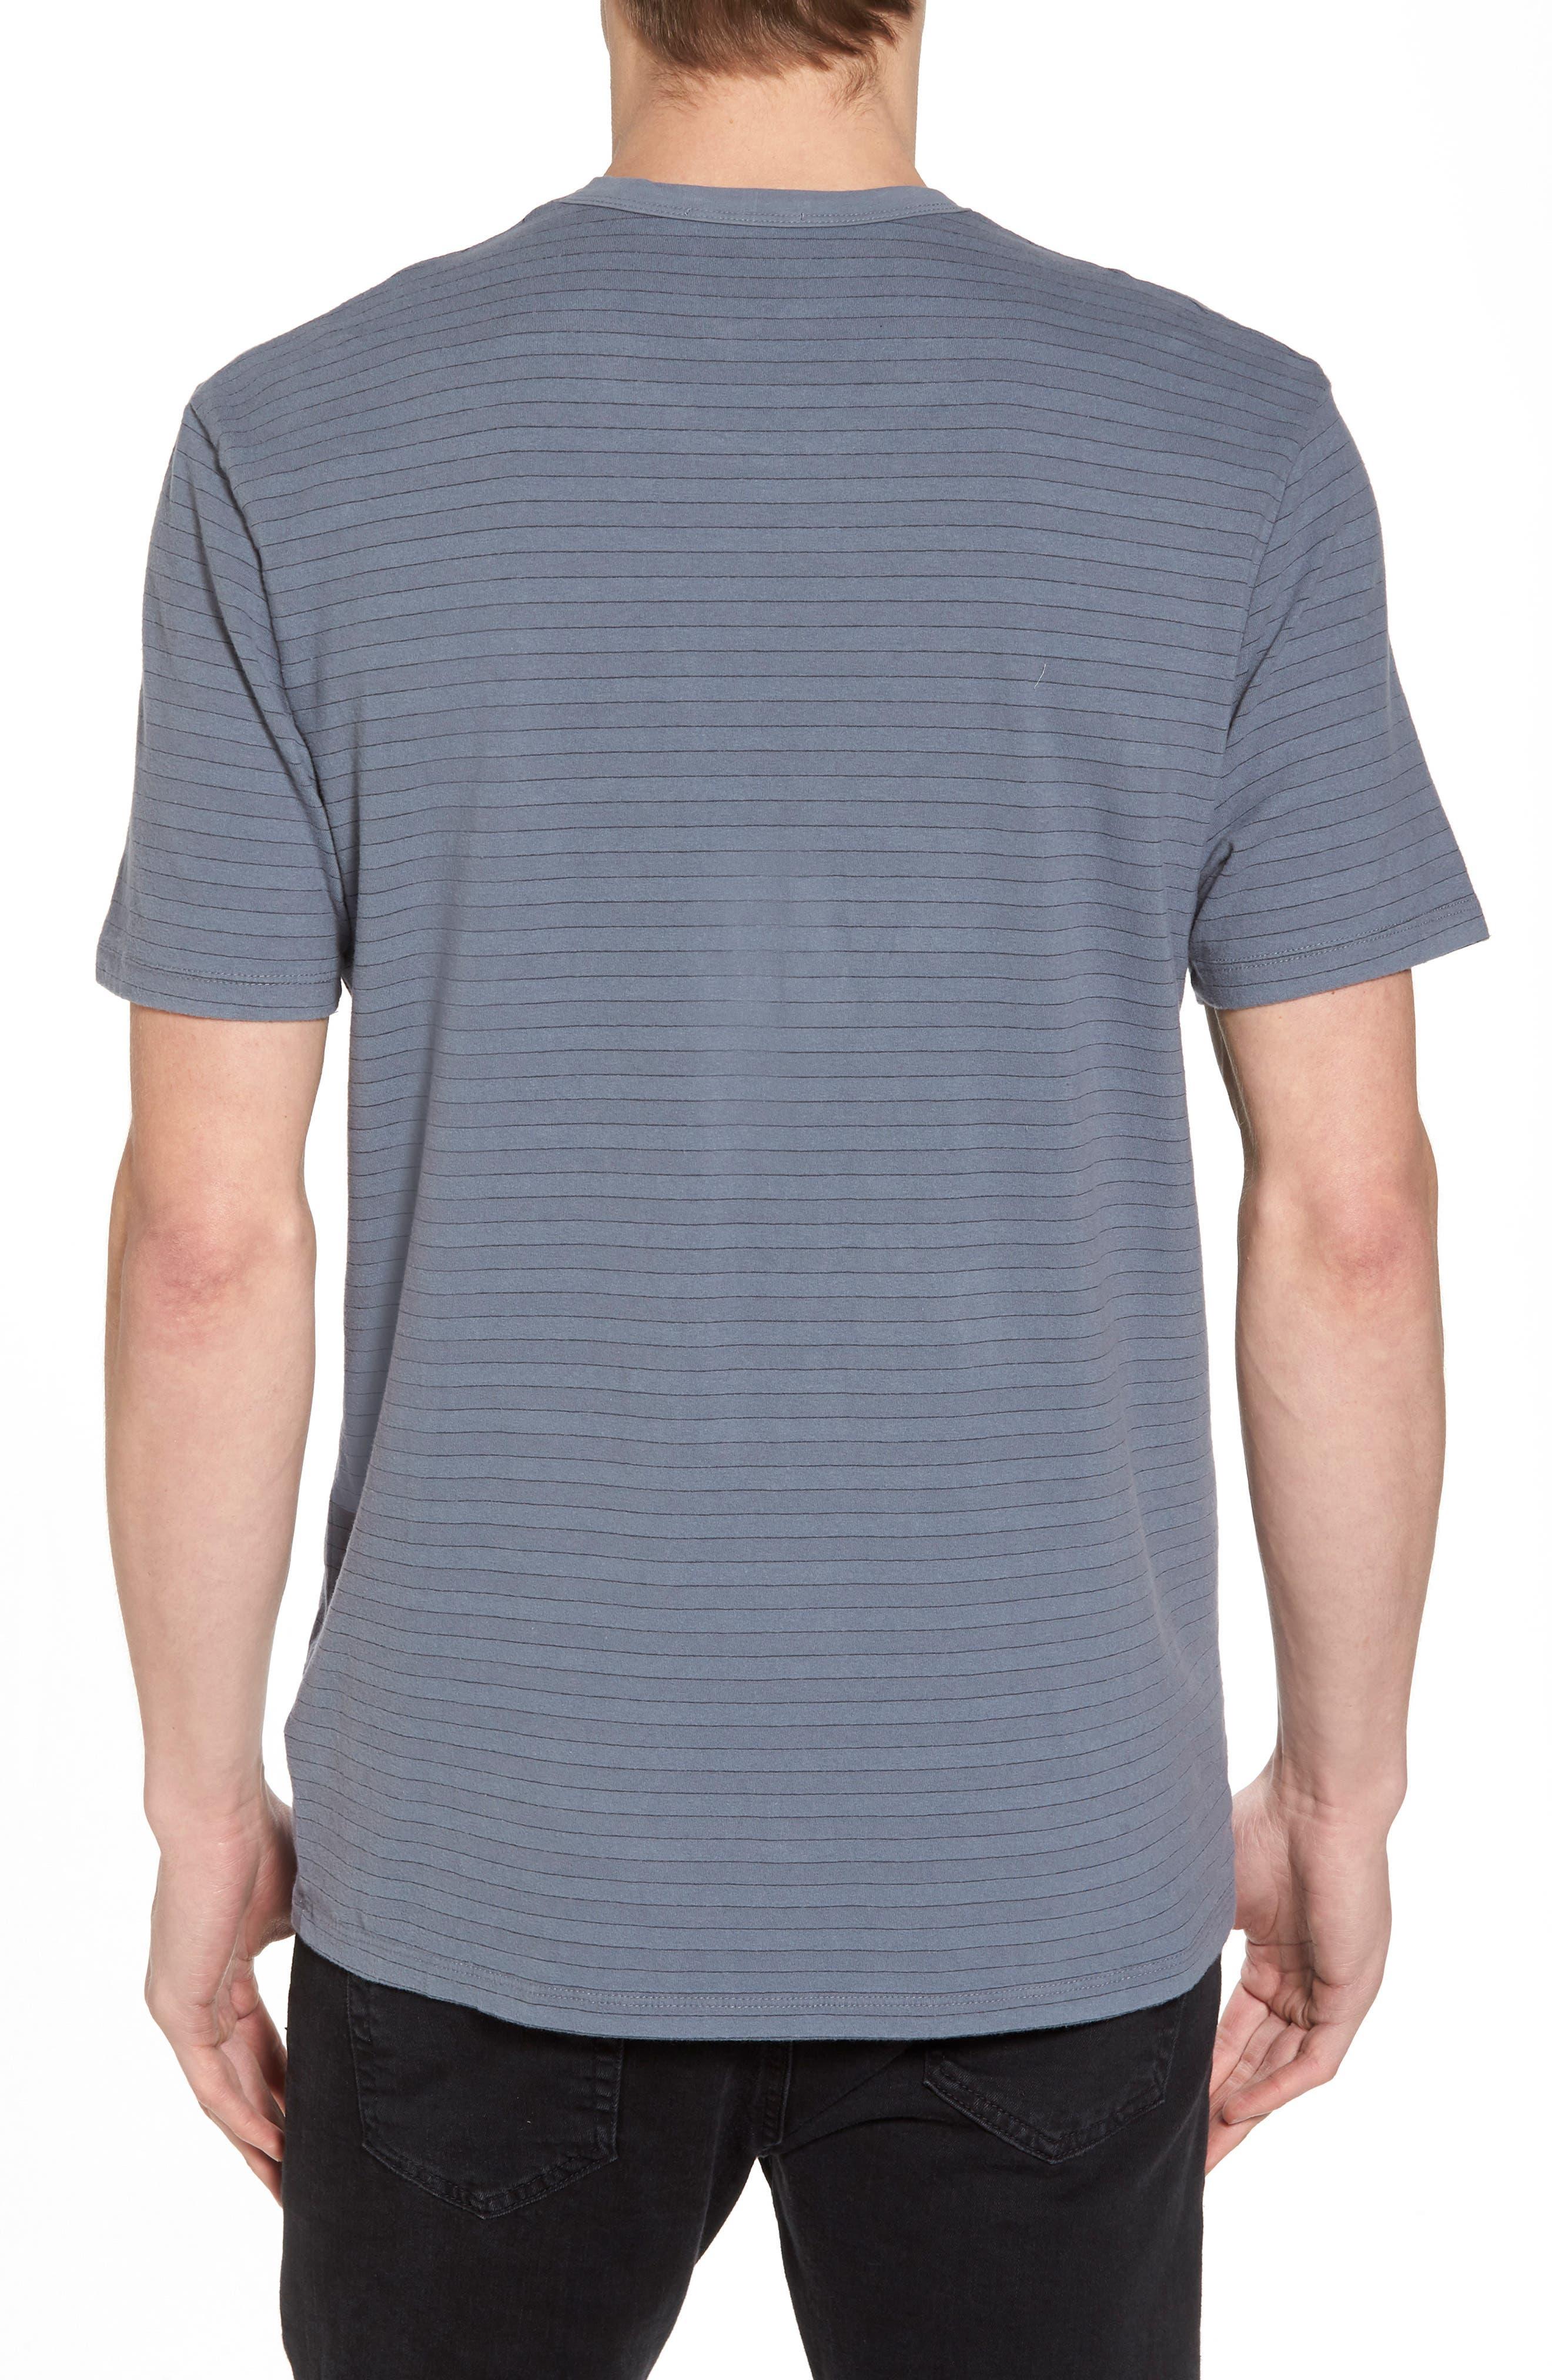 Alternate Image 2  - James Perse Shadow Stripe Pocket T-Shirt